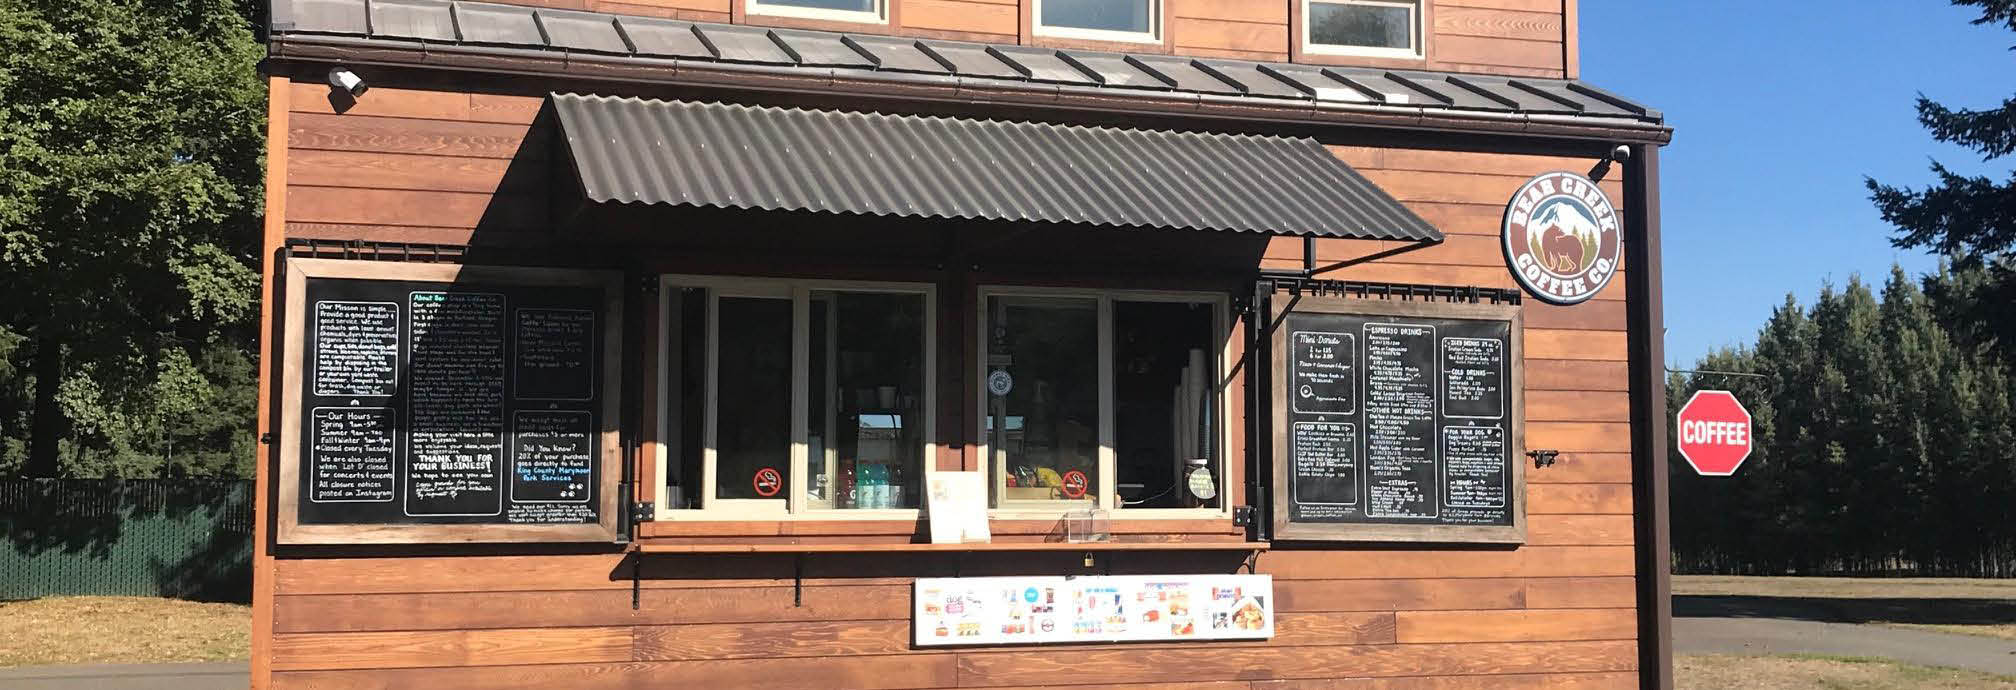 Bear Creek Coffee Co. main banner image - Redmond, WA - Marymoor Park